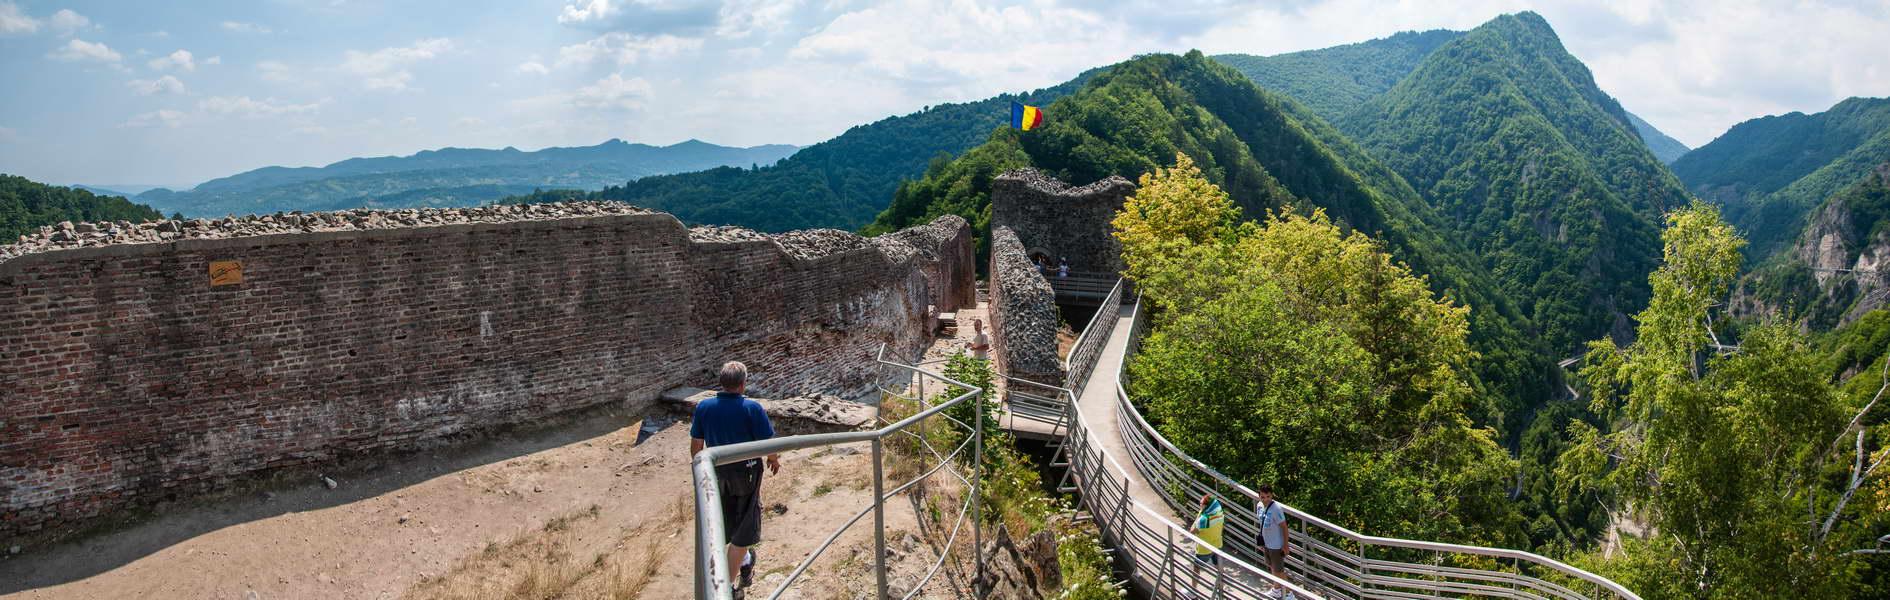 Rumunija_2015_317